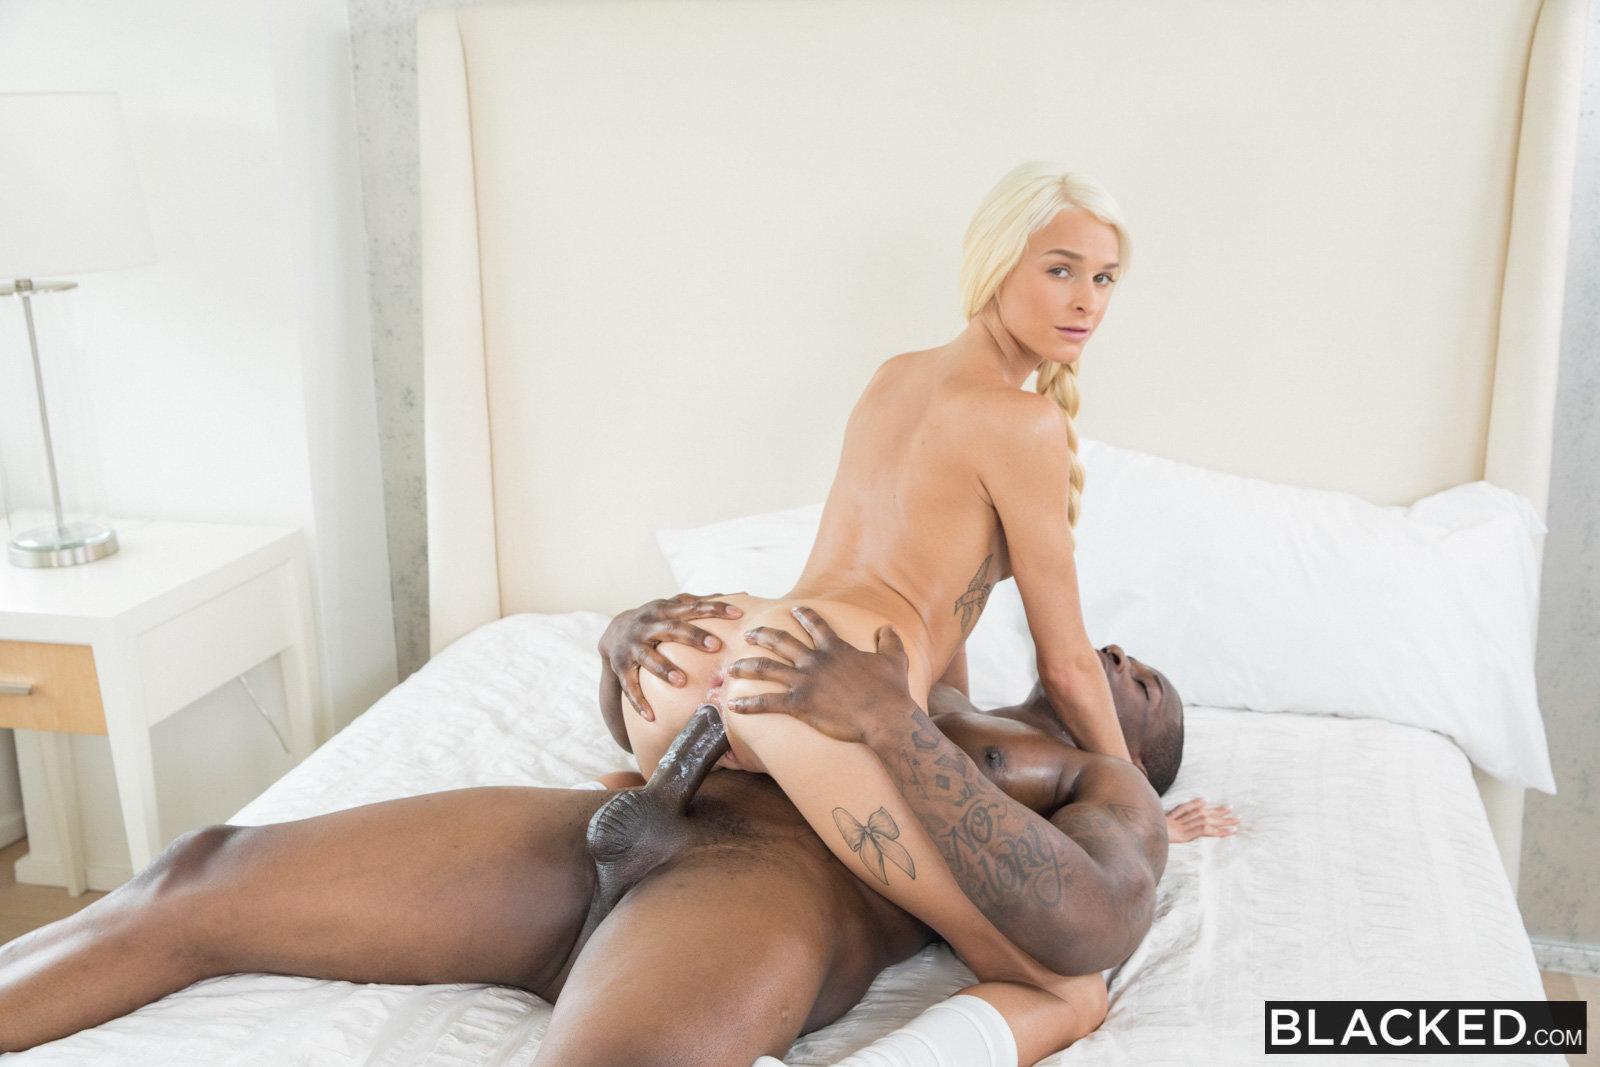 Emma Hix shown stuffed full of sweaty black dick